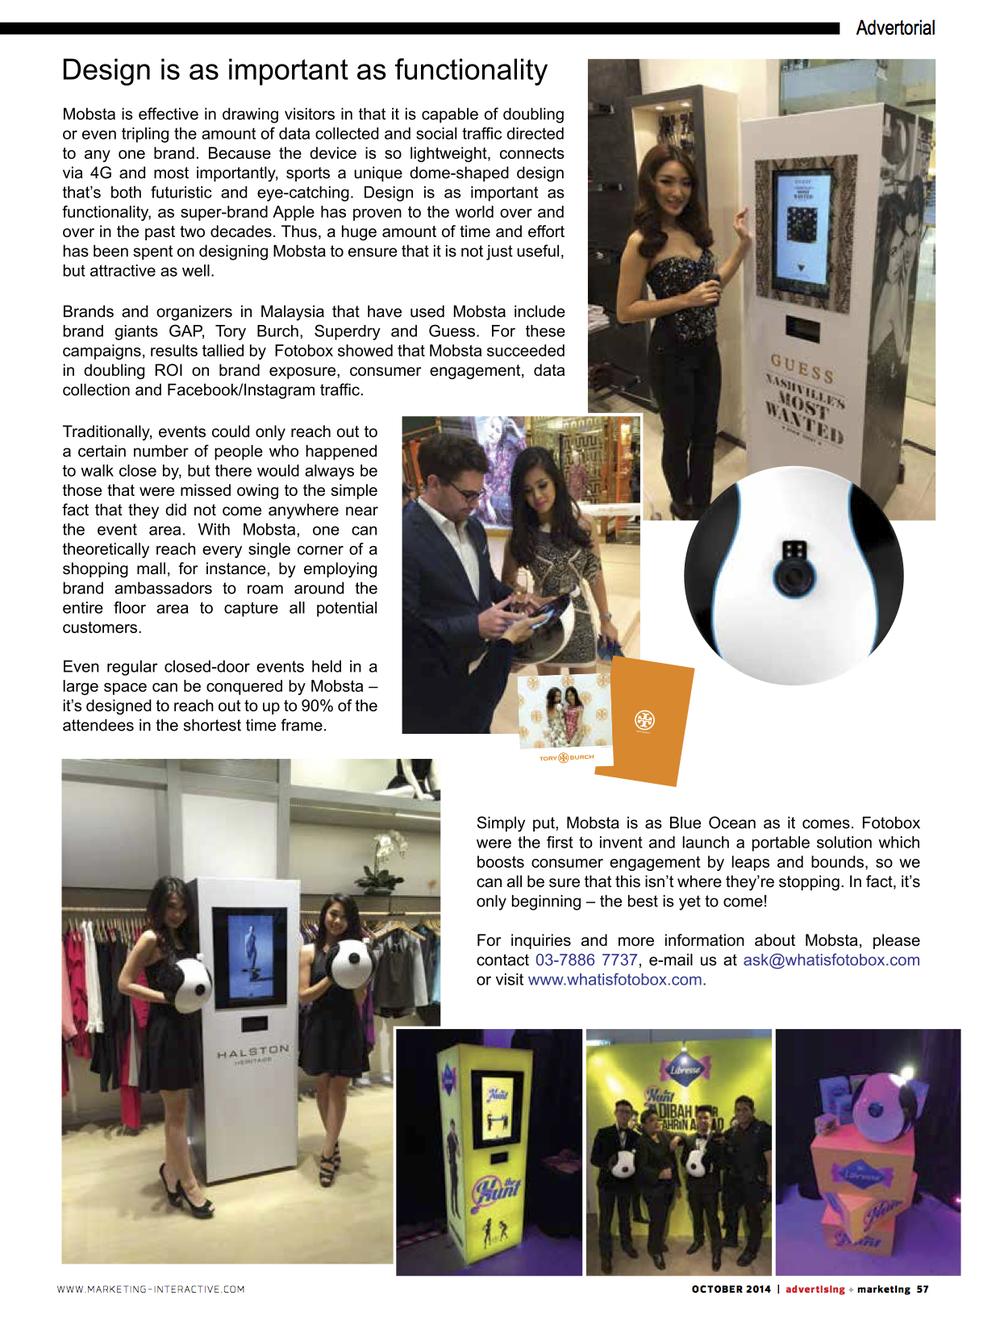 Fotobox Dec 2014 Editiorial (A+M Malaysia Magazine)B.jpg